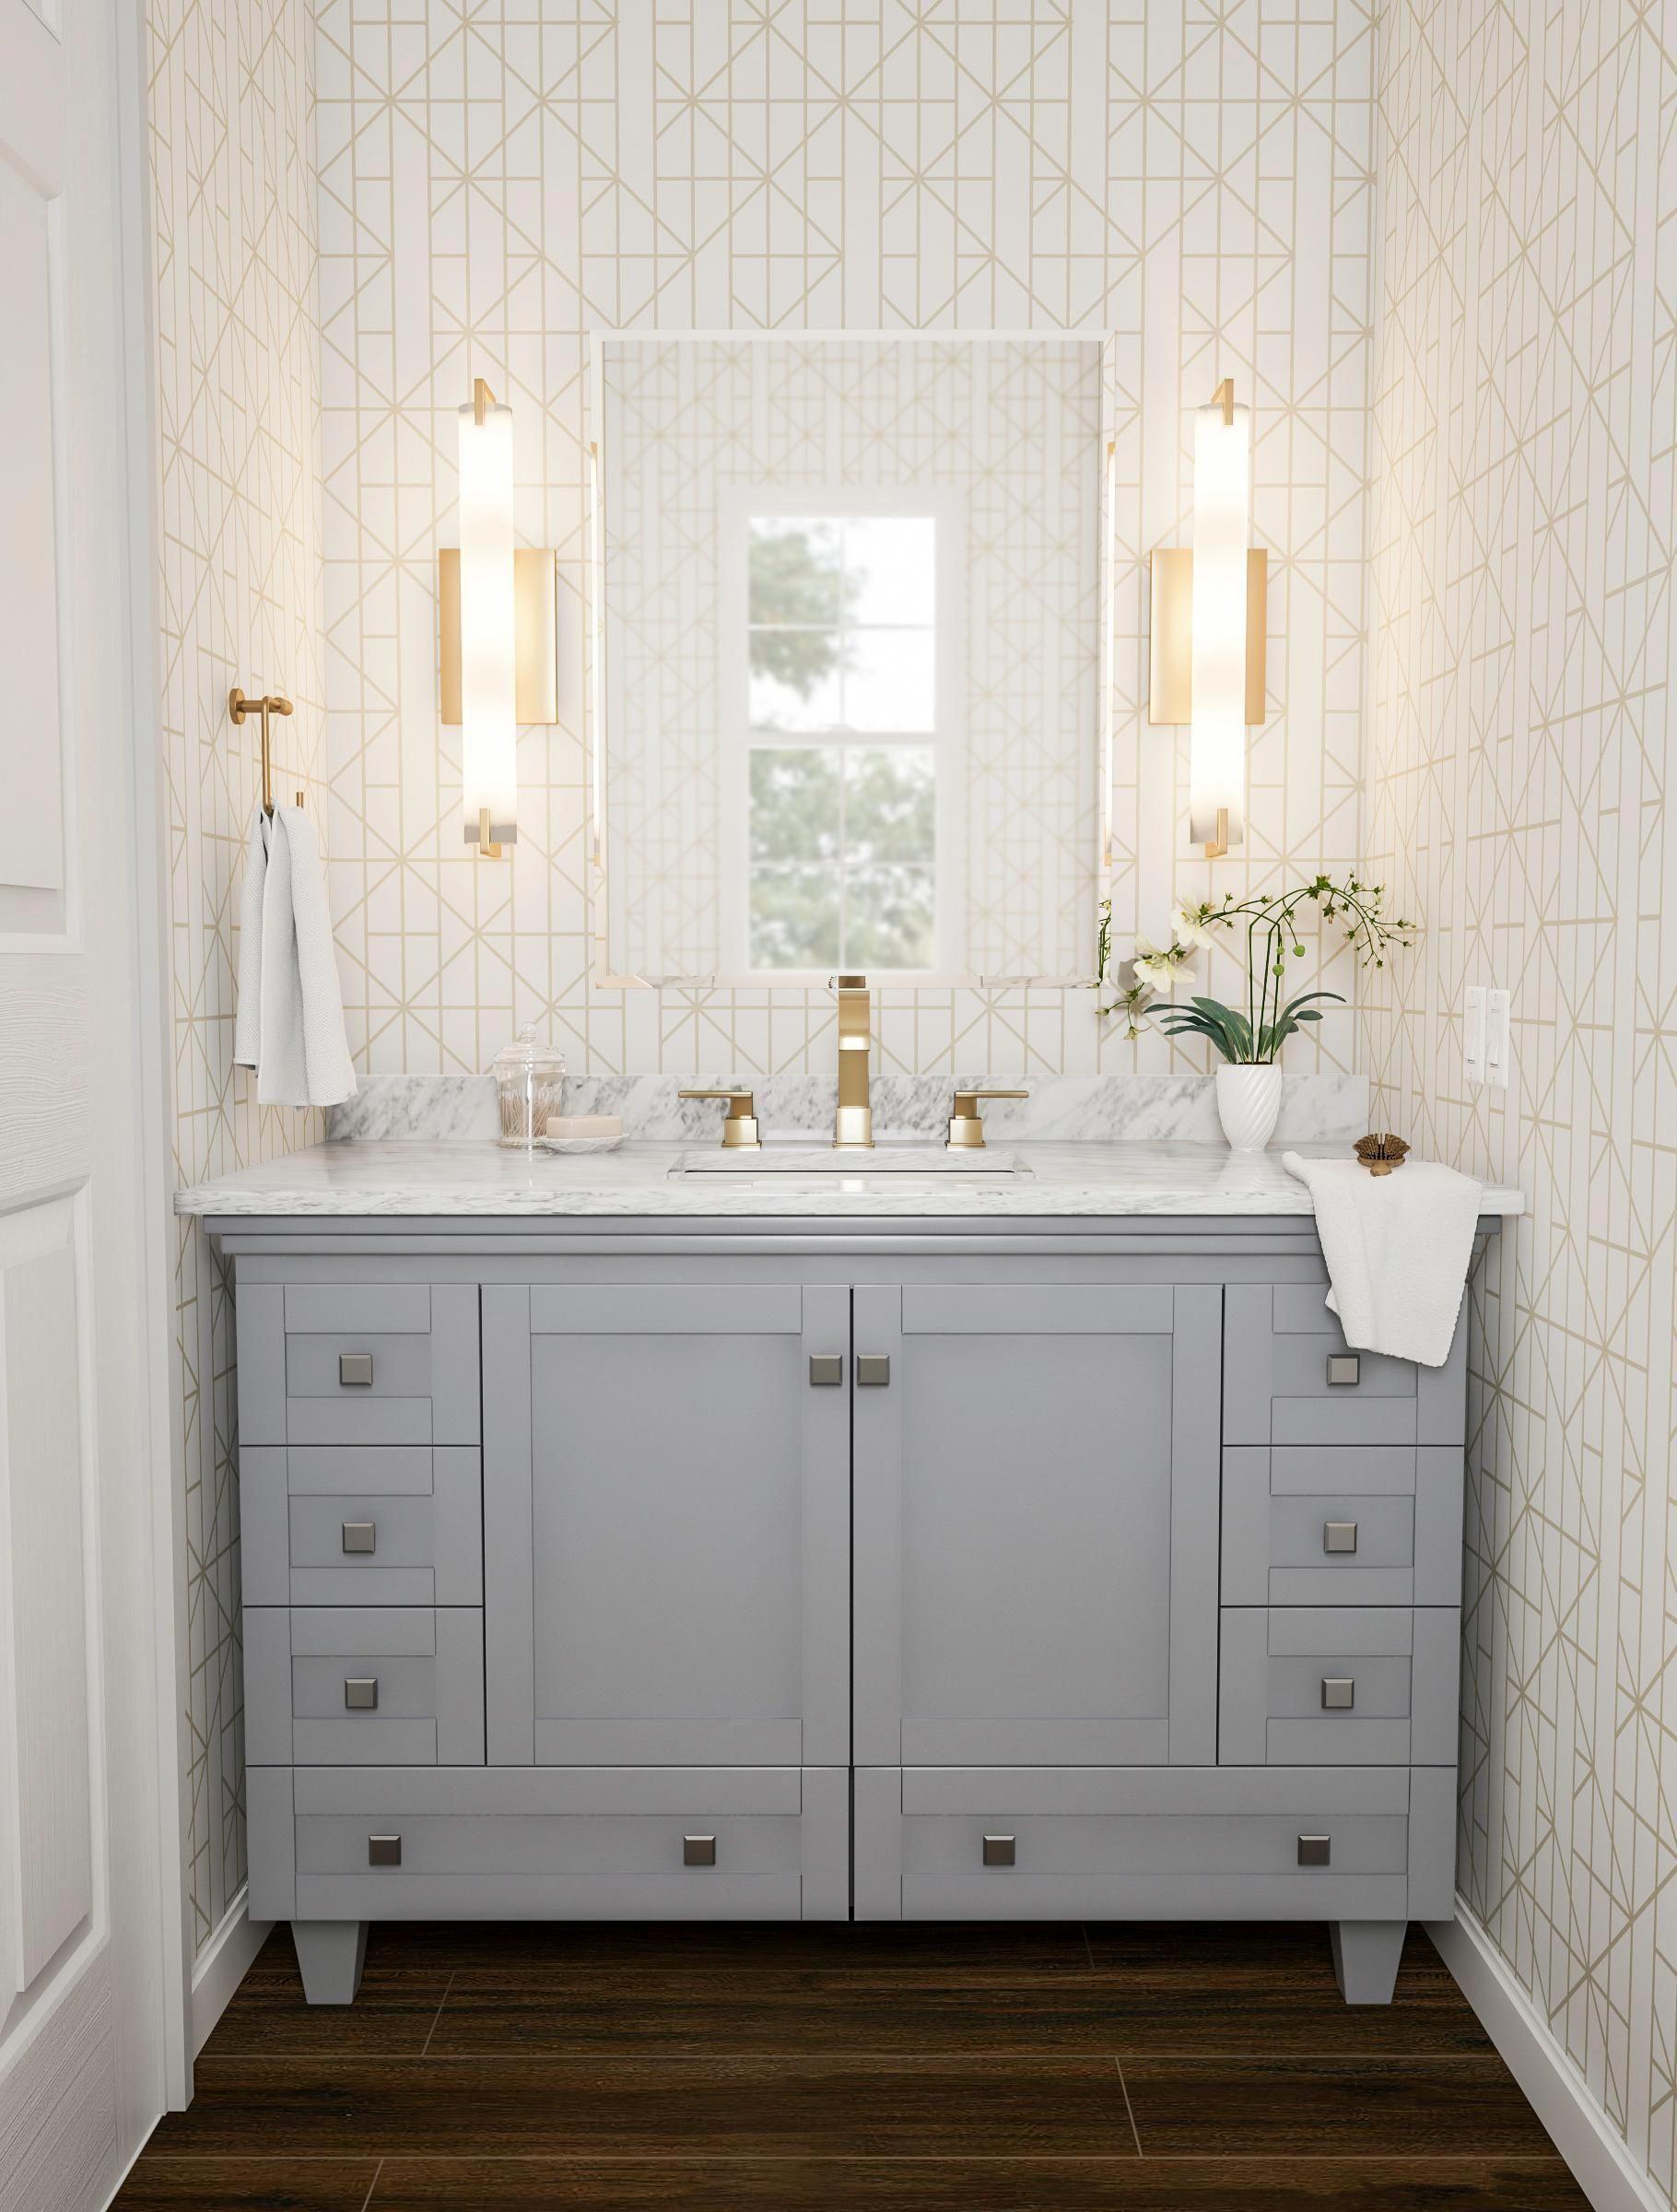 White Bathroom Accessories  Whole Bathroom Sets  Ceramic Bath